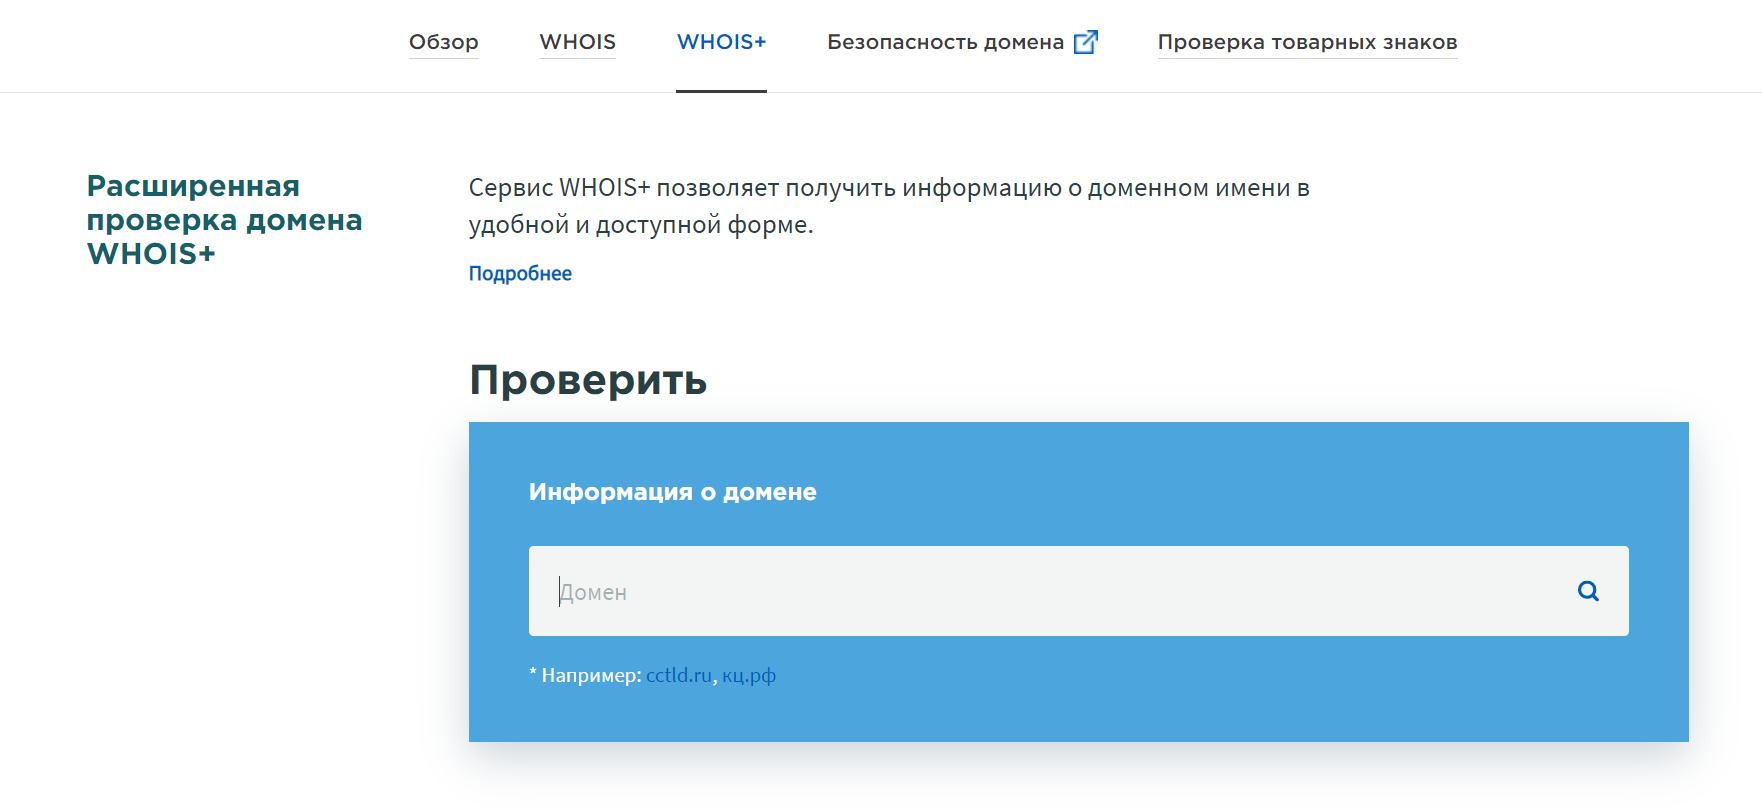 Интерфейс WHOIS+